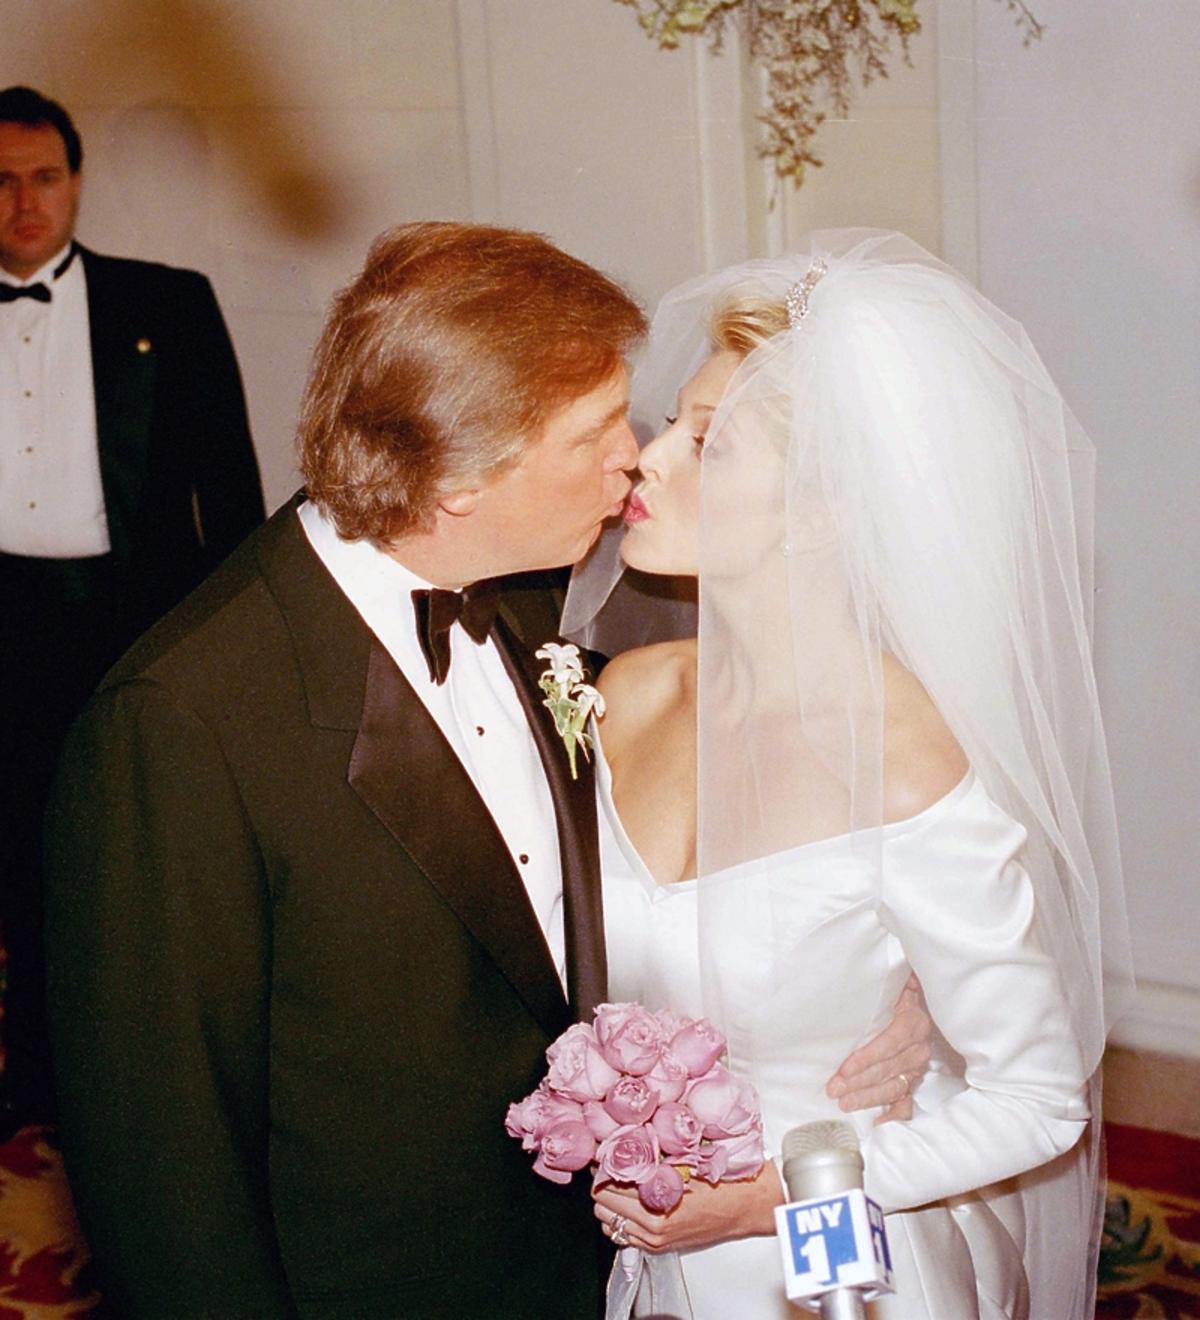 Ślub Donalda i Marli Trump w nowojorskim hotelu Plaza